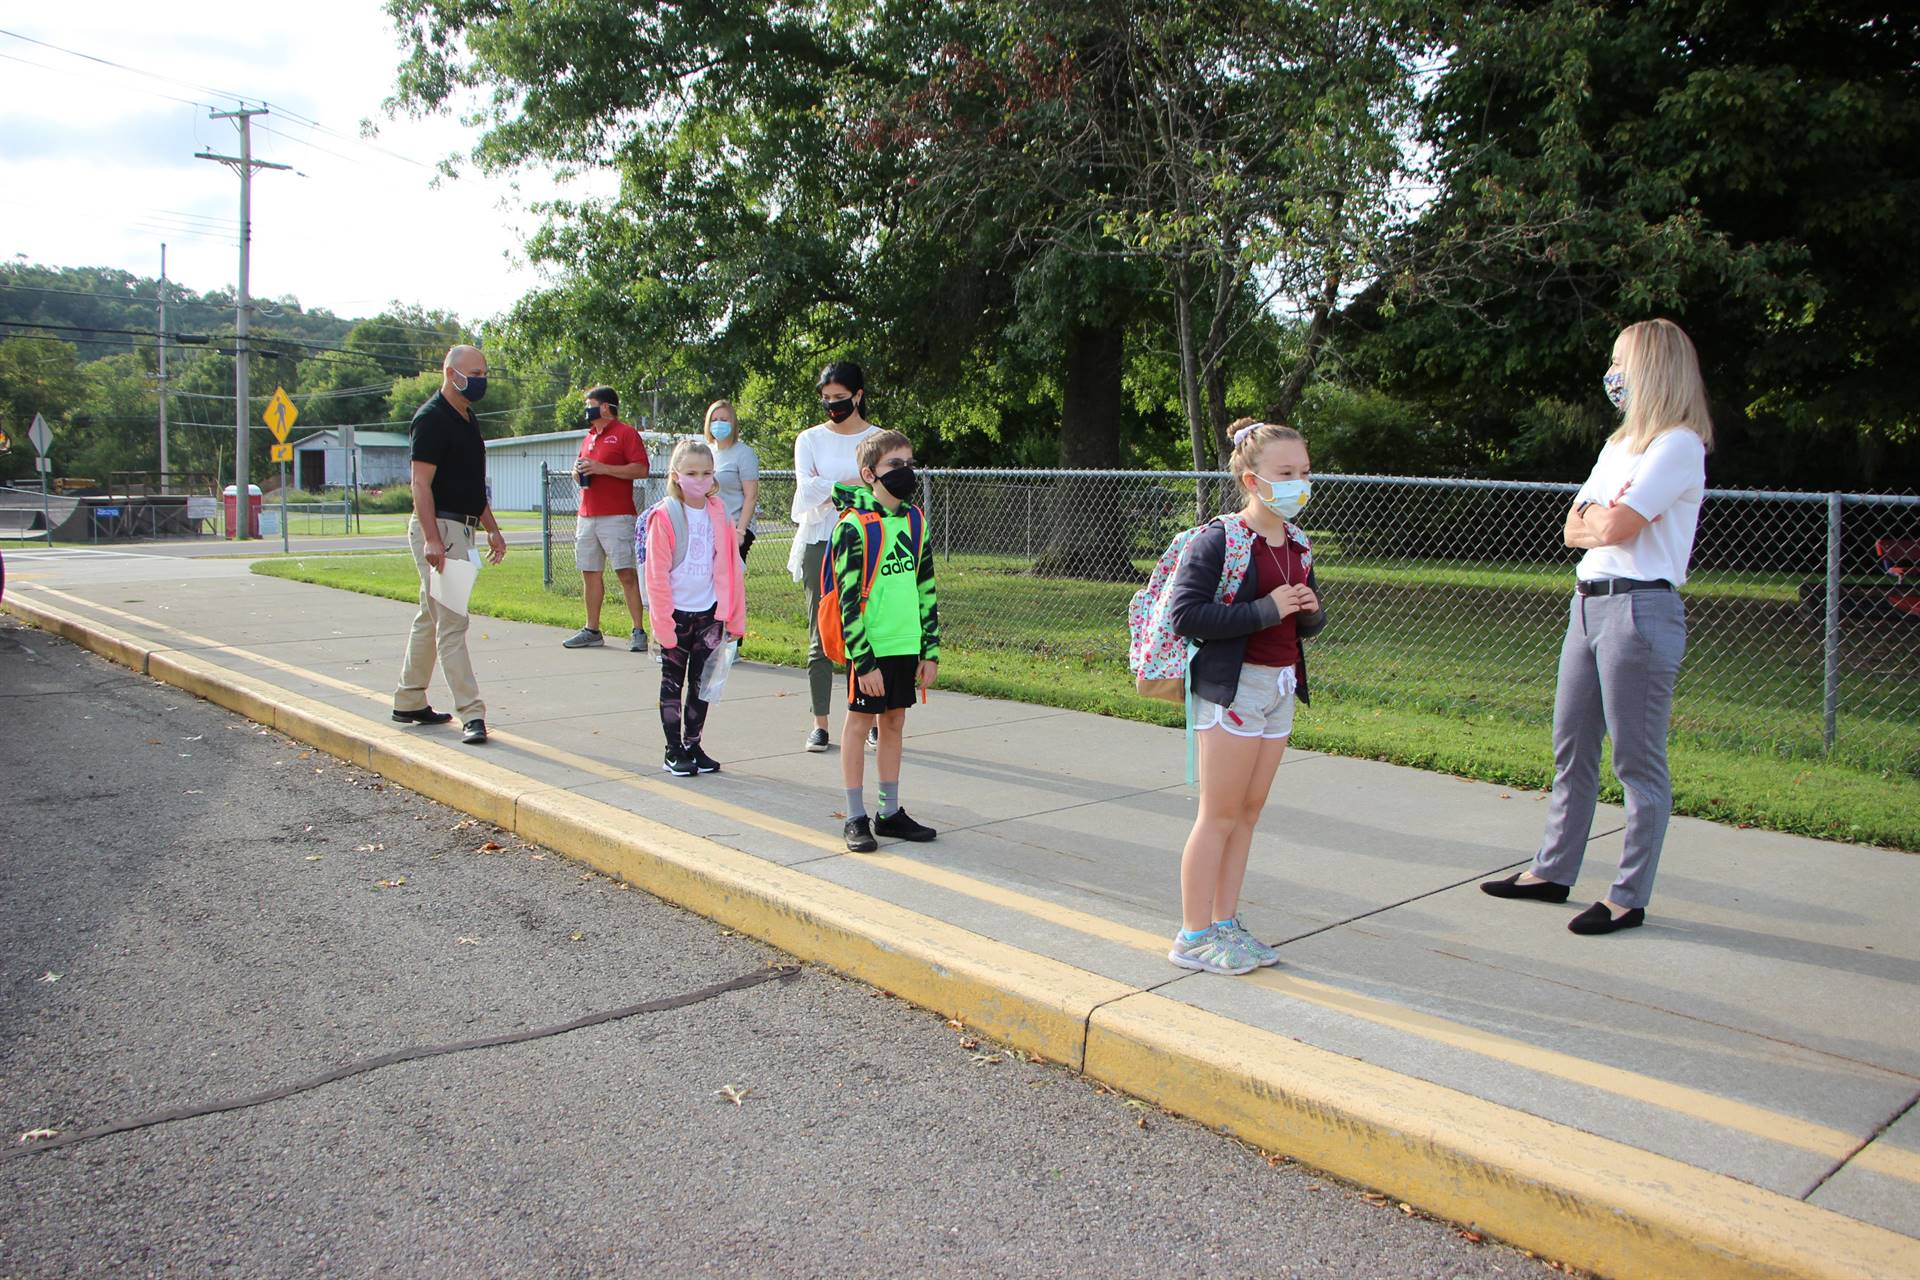 Three students stand on sidewalk next to teachers